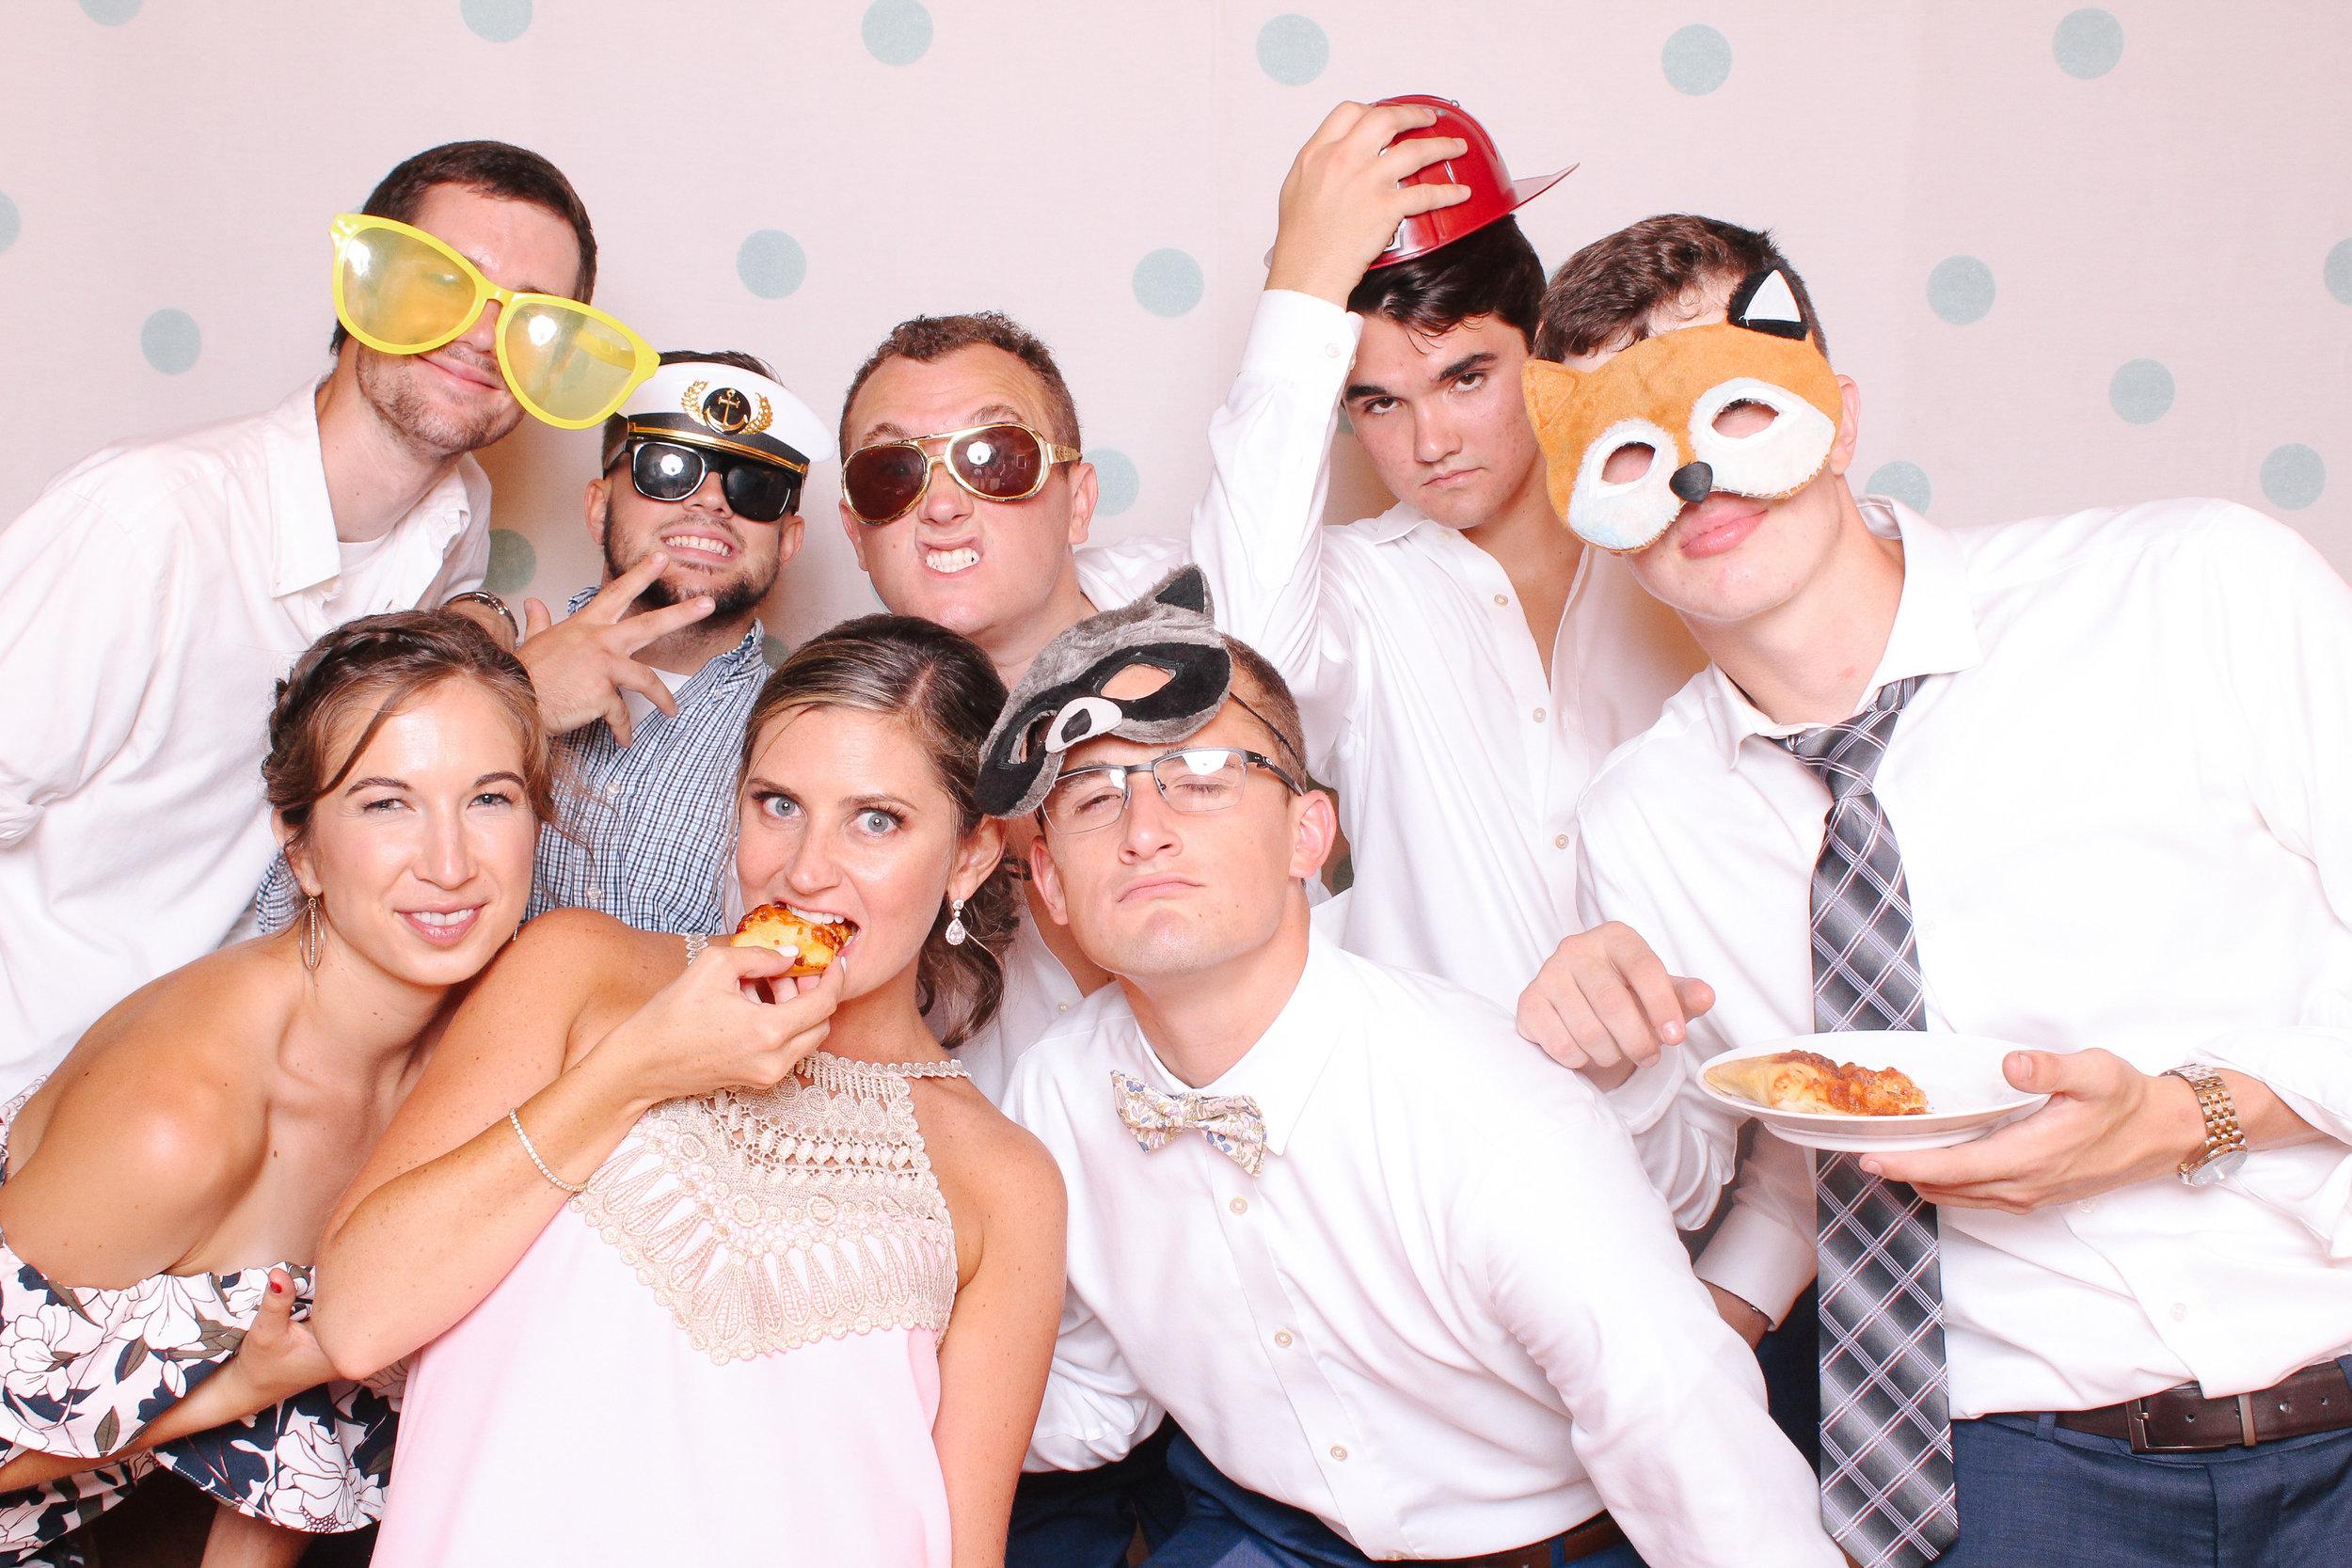 0215 Cleveland Wedding Photobooth too much awesomeness.jpg